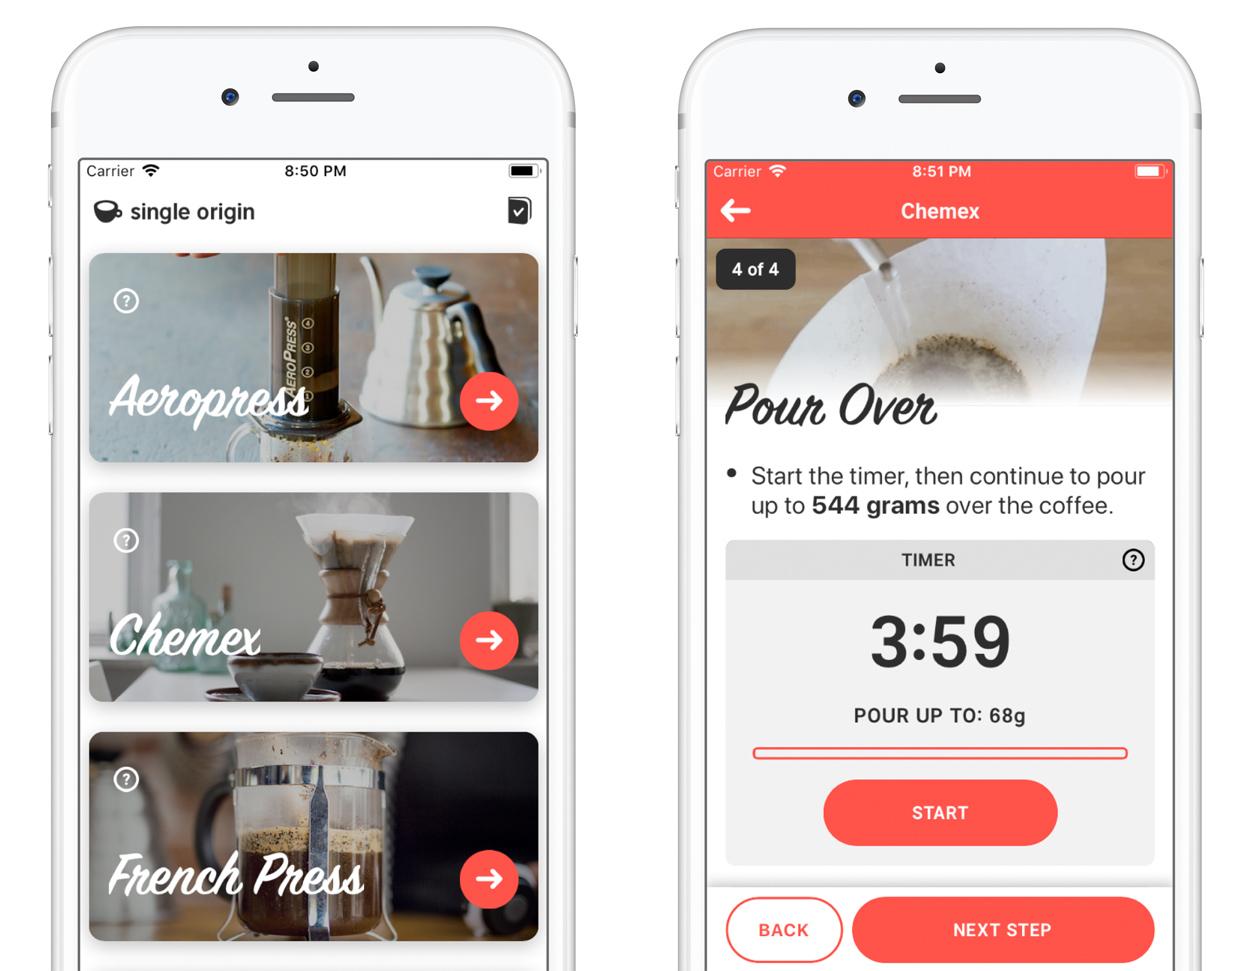 Gratis singlebörse app [PUNIQRANDLINE-(au-dating-names.txt) 61